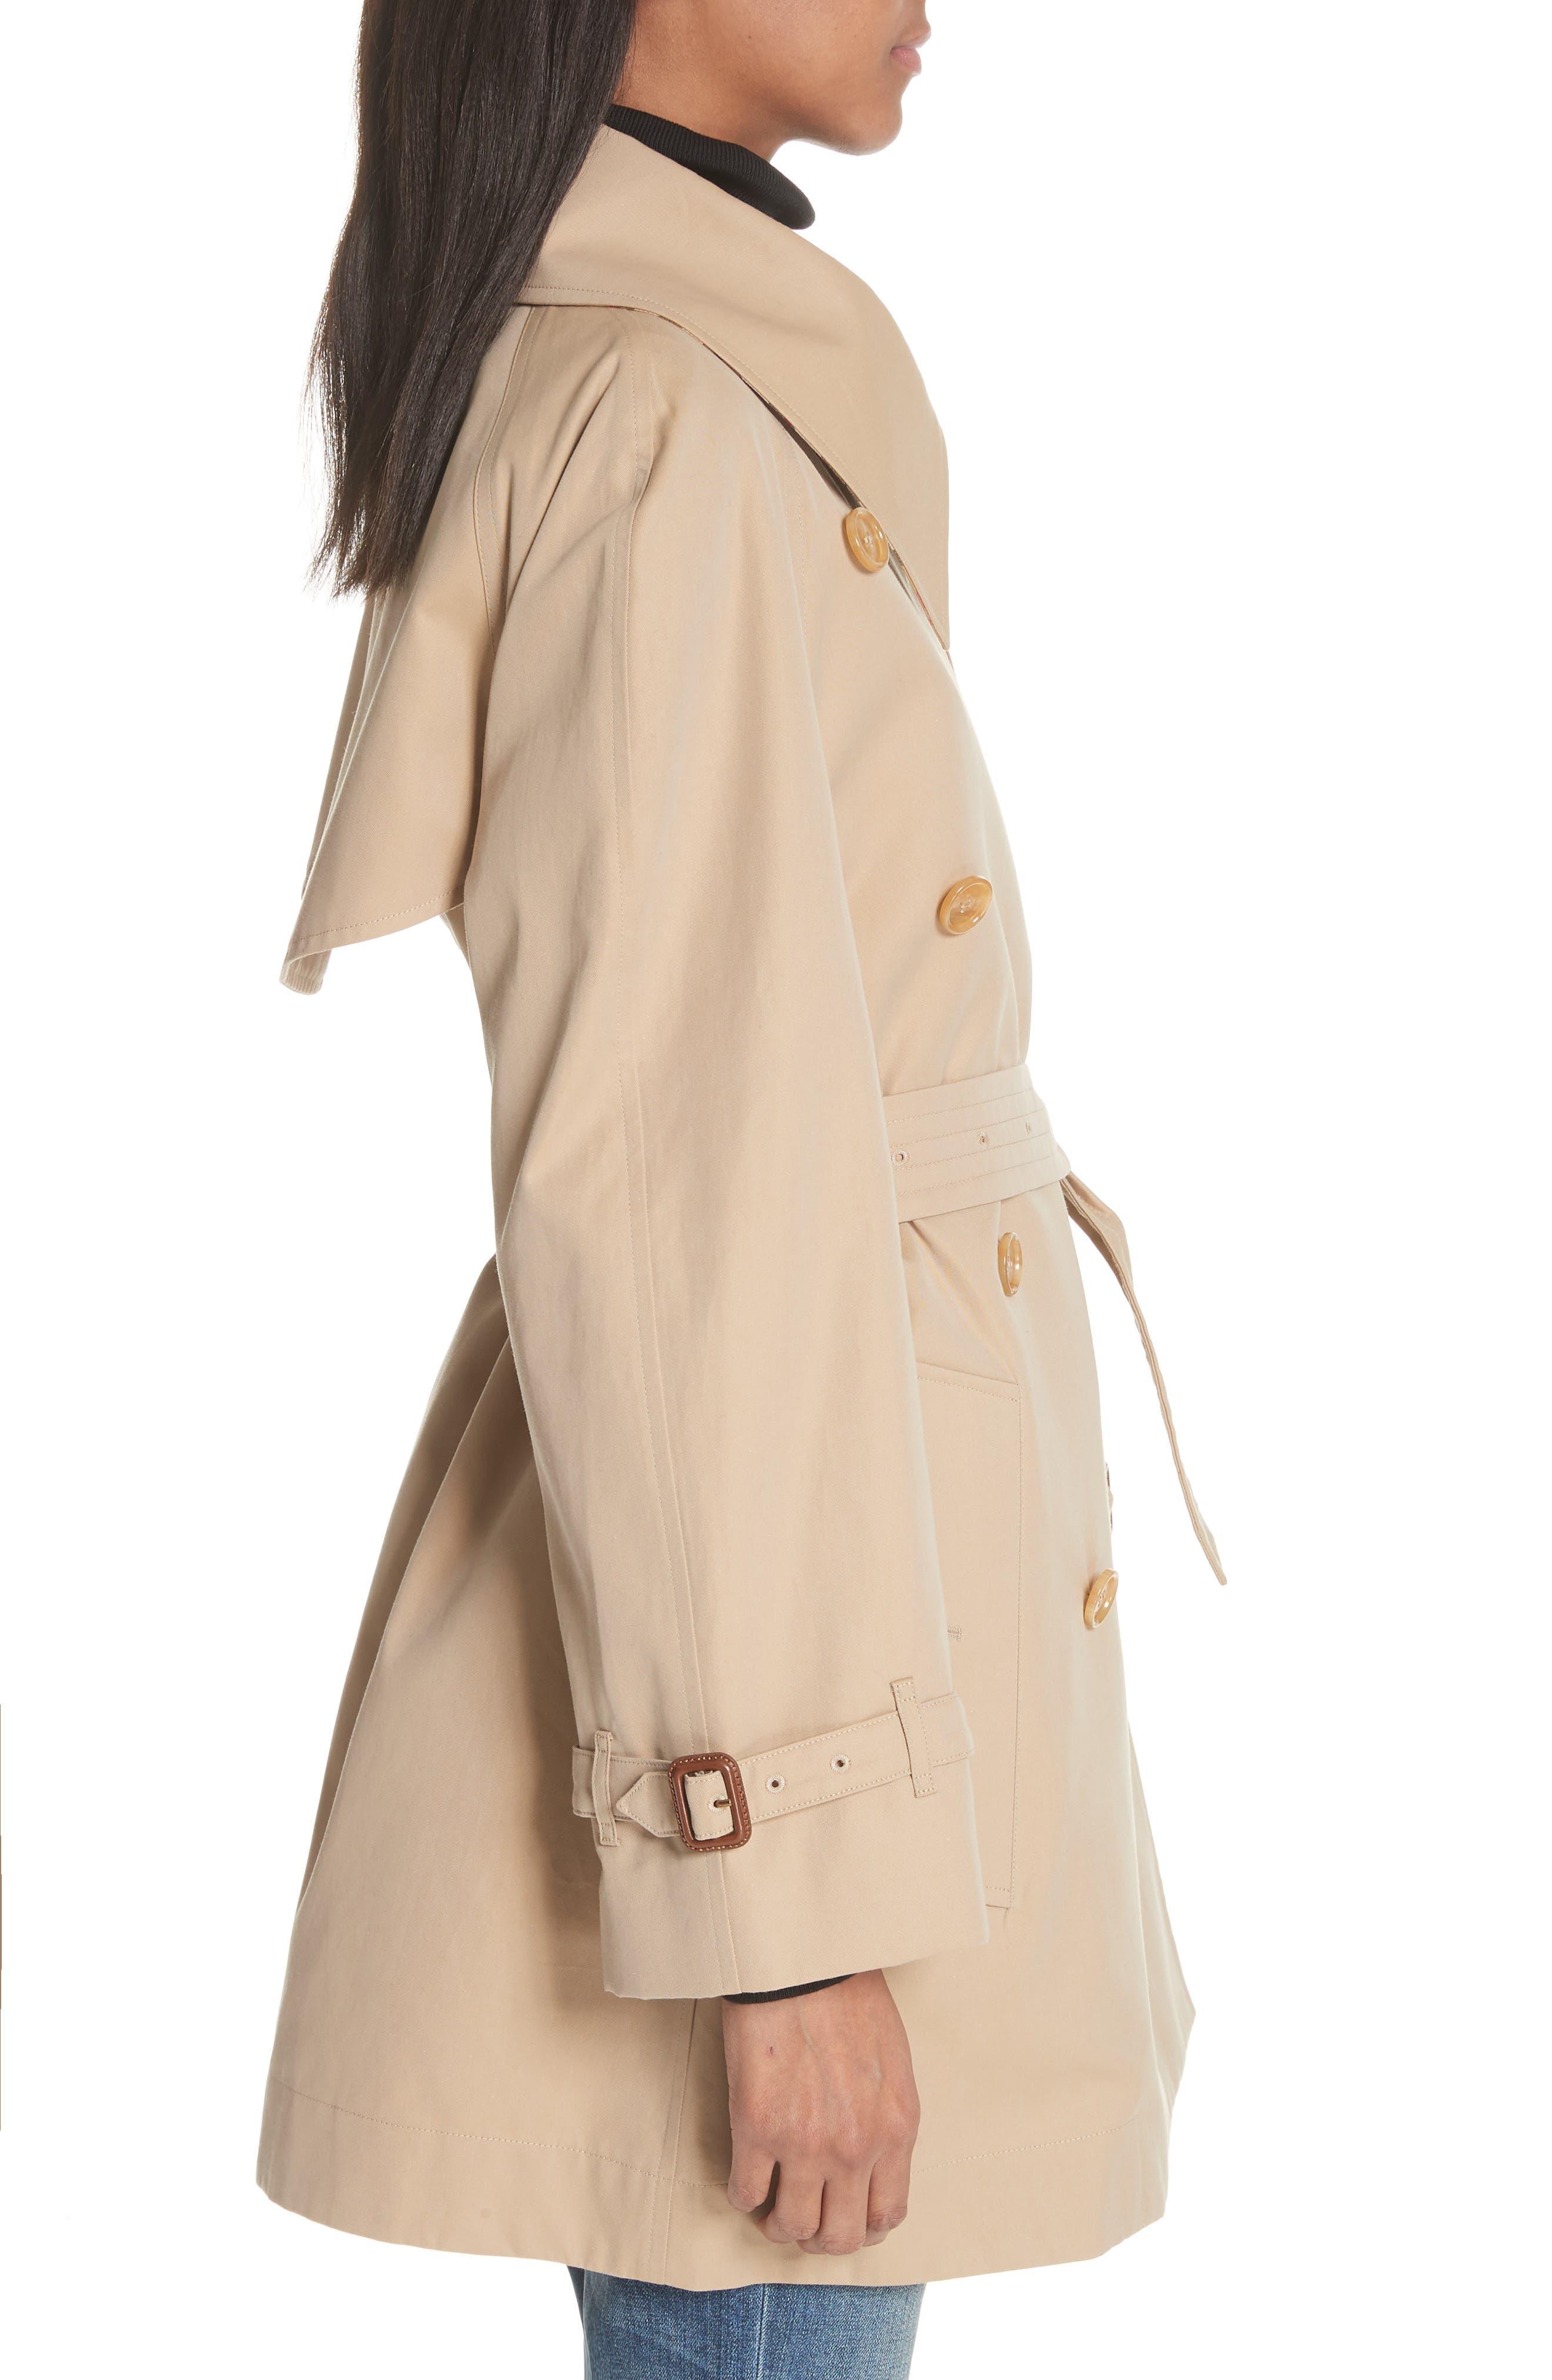 Fortingall Cotton Gabardine Trench Coat,                             Alternate thumbnail 3, color,                             Honey